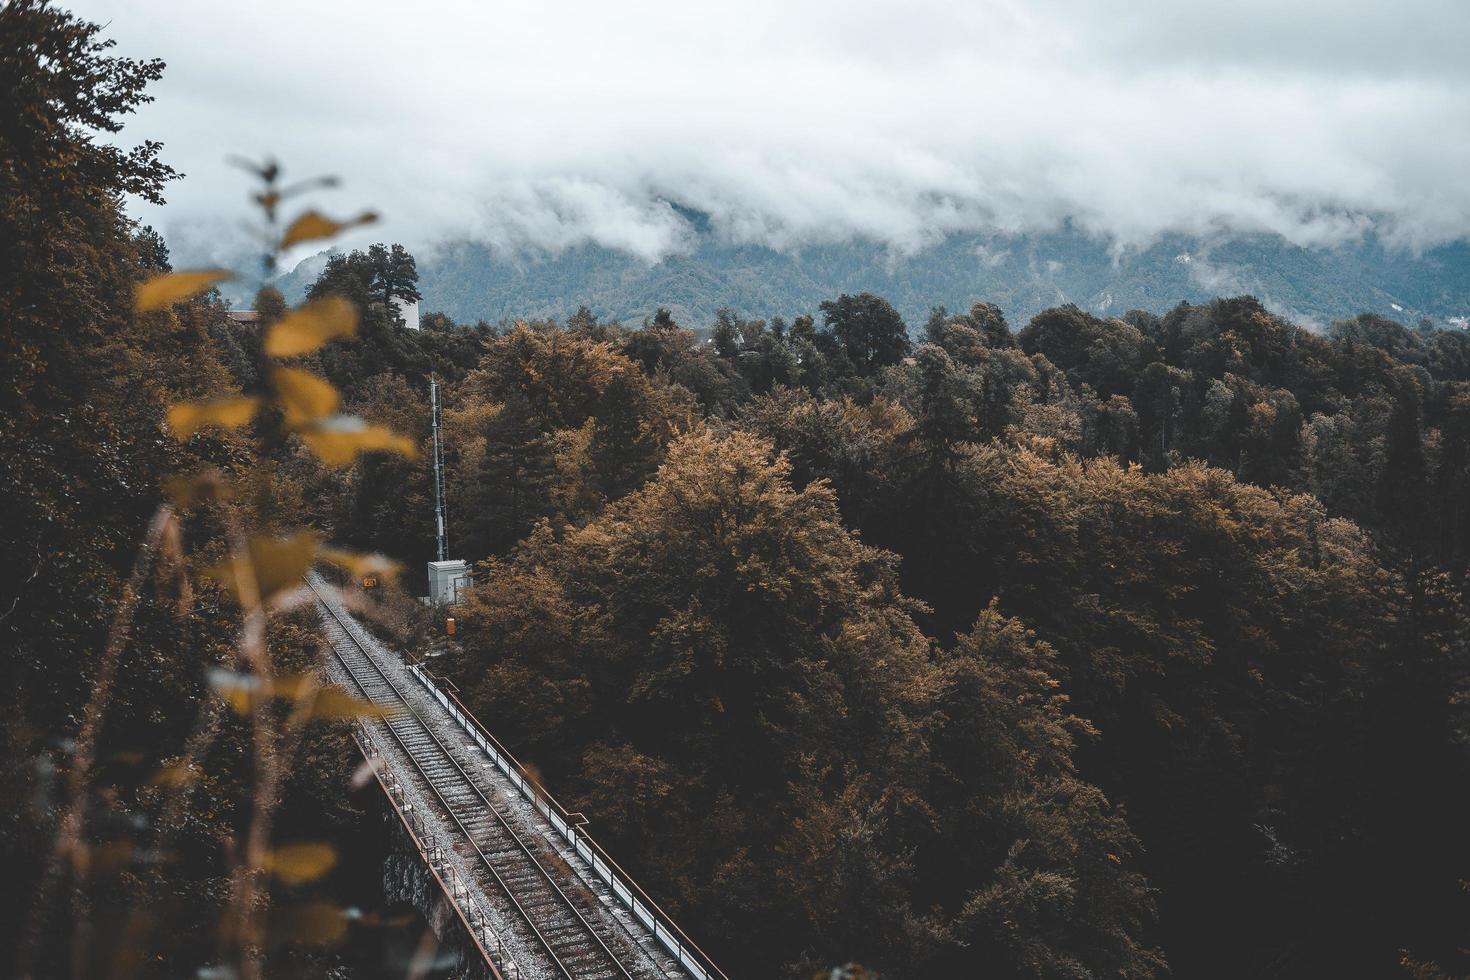 treinsporen dichtbij bos onder bewolkte hemel foto